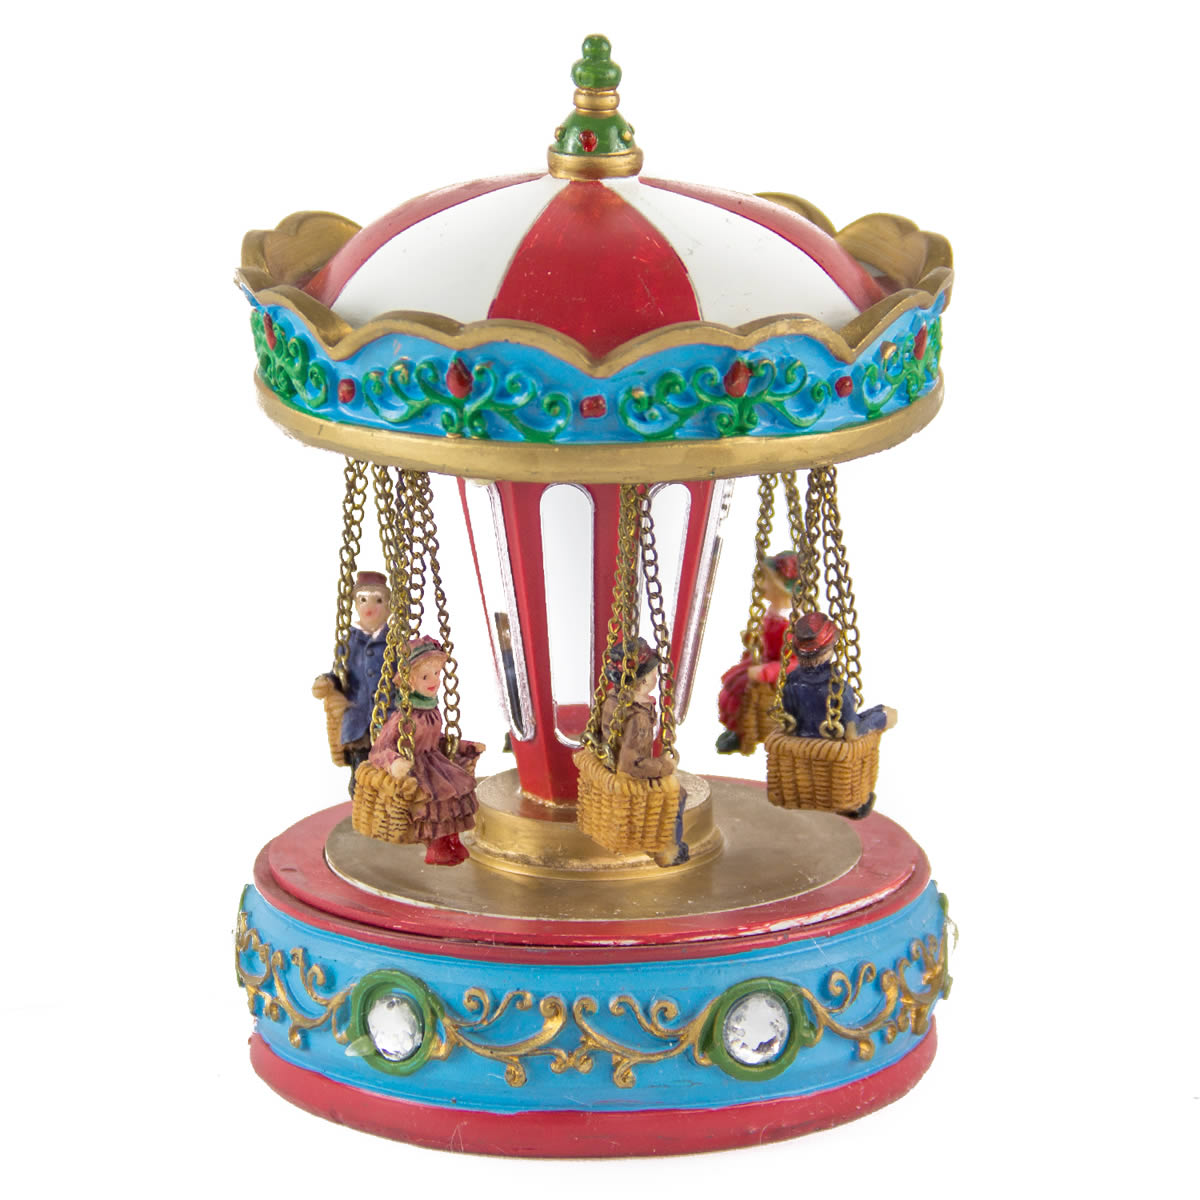 Flying Chairs Merry Go Around anim/music bop